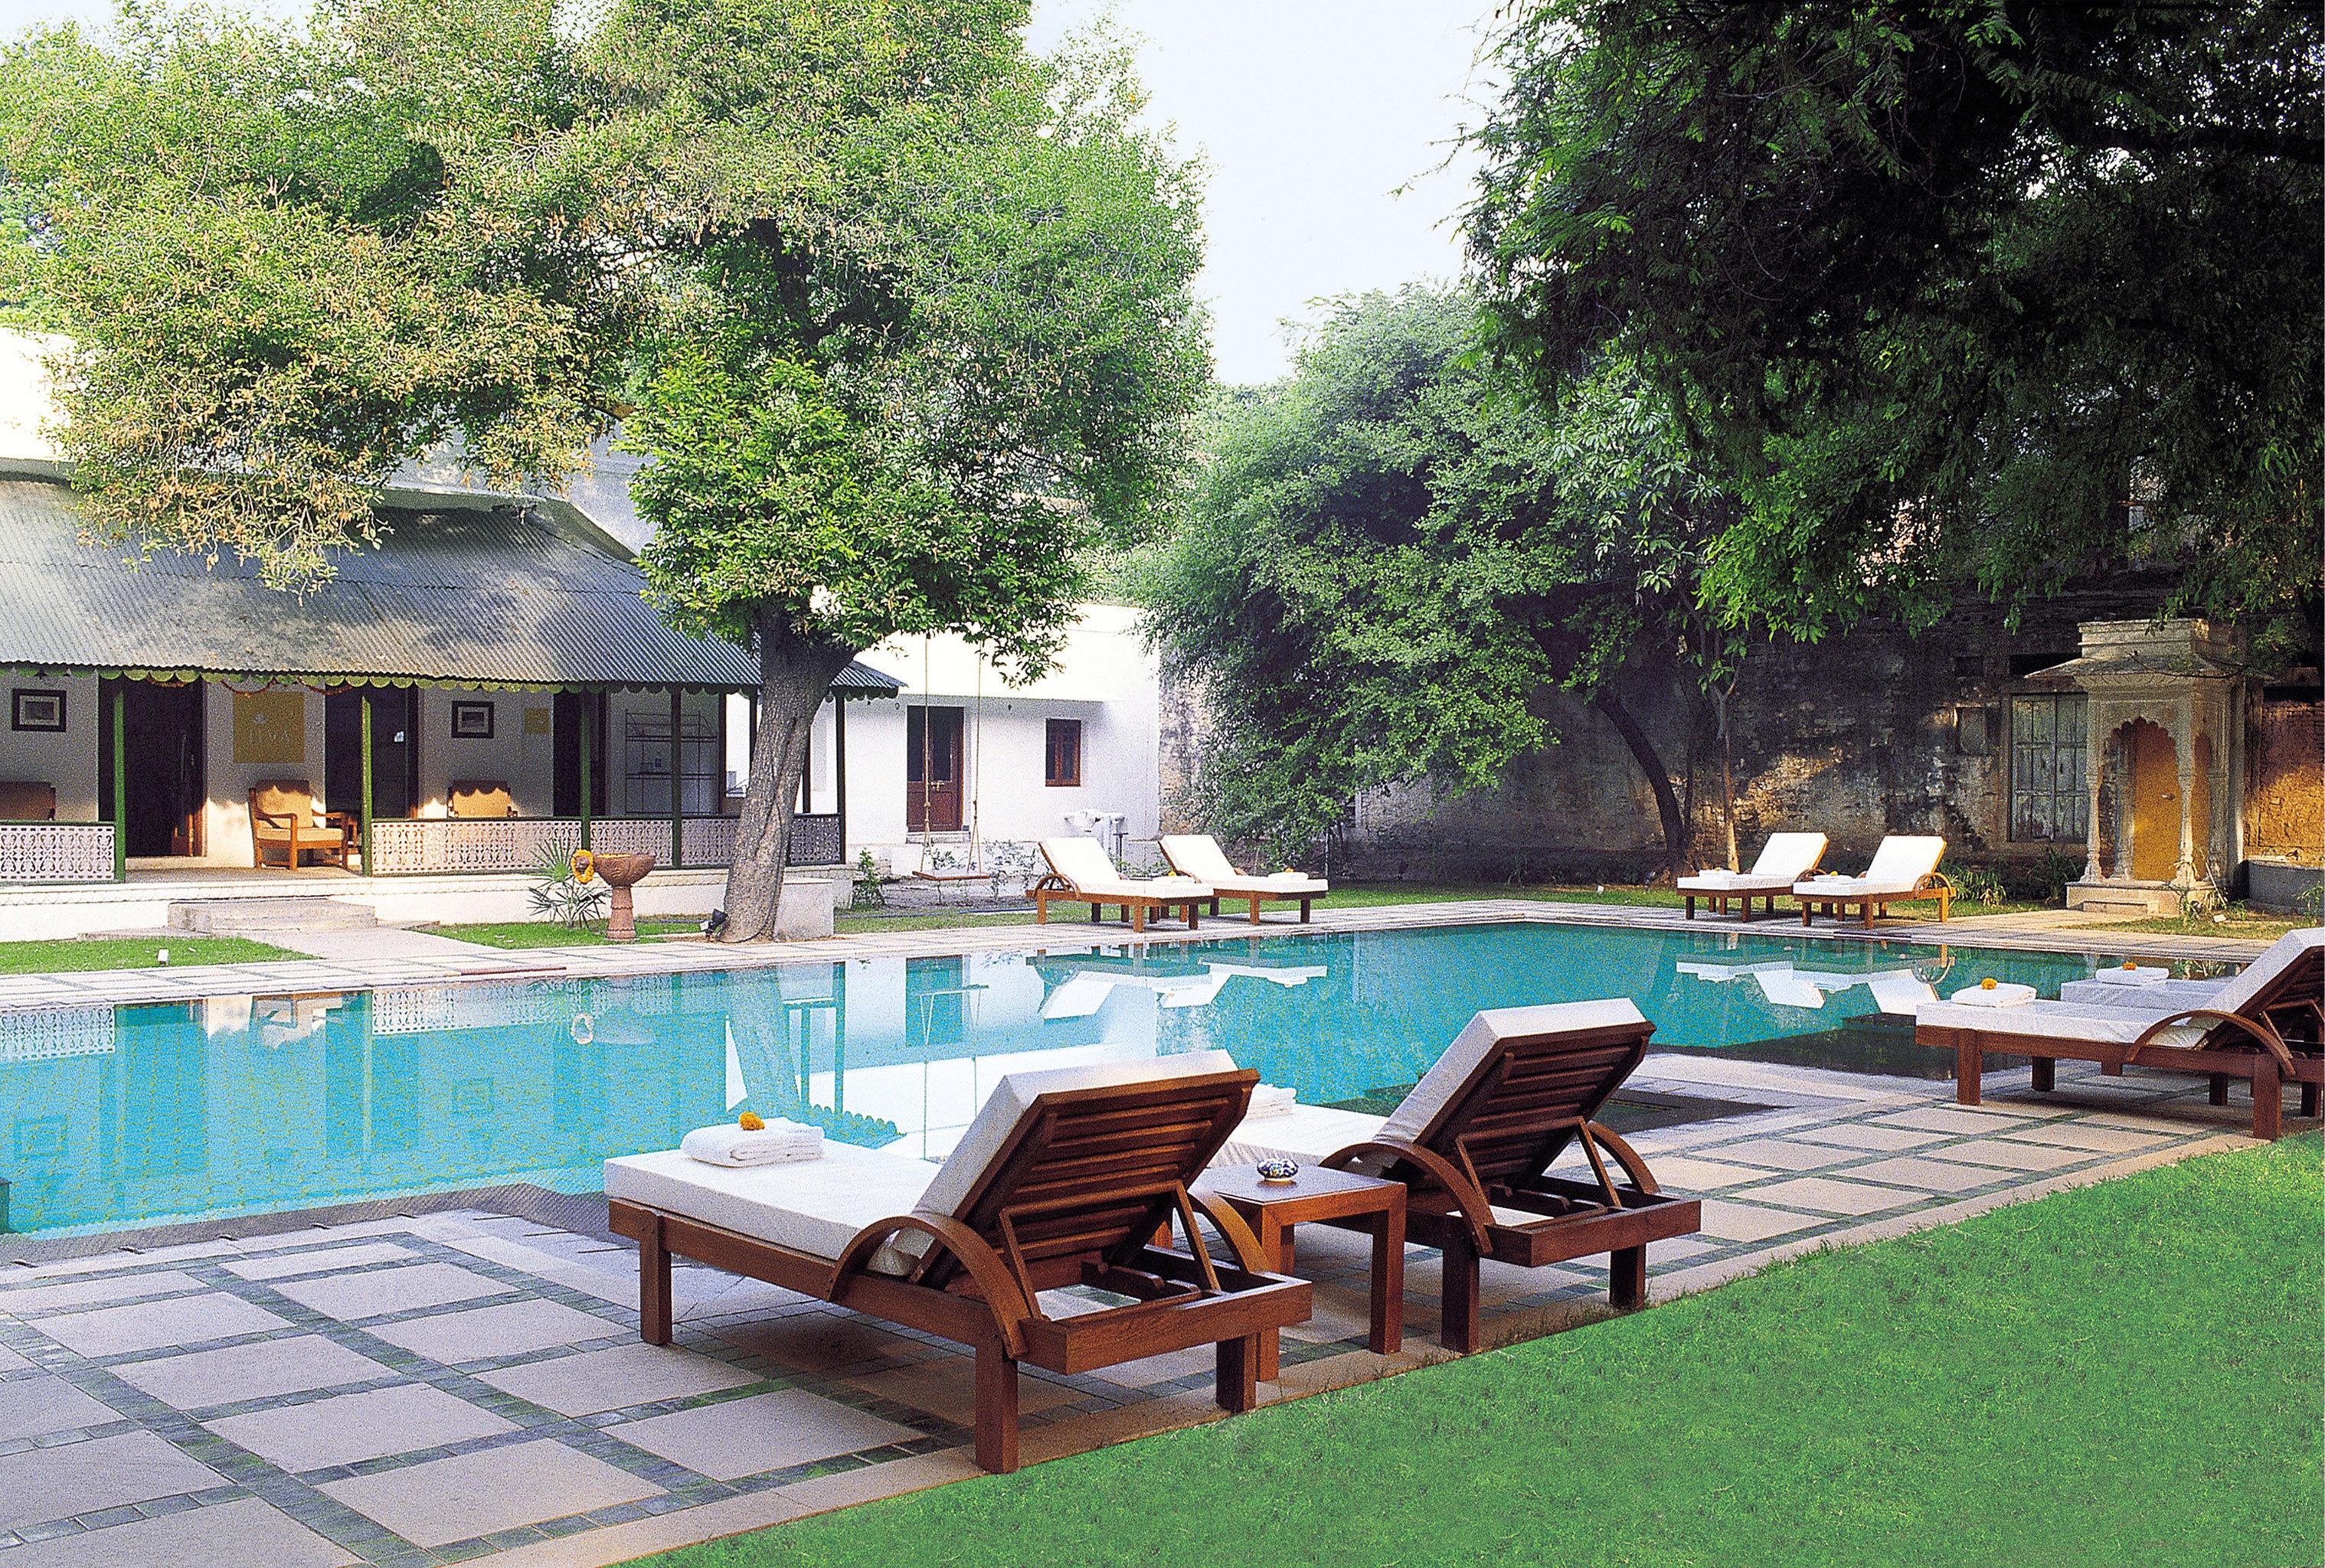 Honeymoon Patio Pool tree chair swimming pool property leisure building Villa lawn backyard Resort cottage hacienda mansion condominium eco hotel set Deck